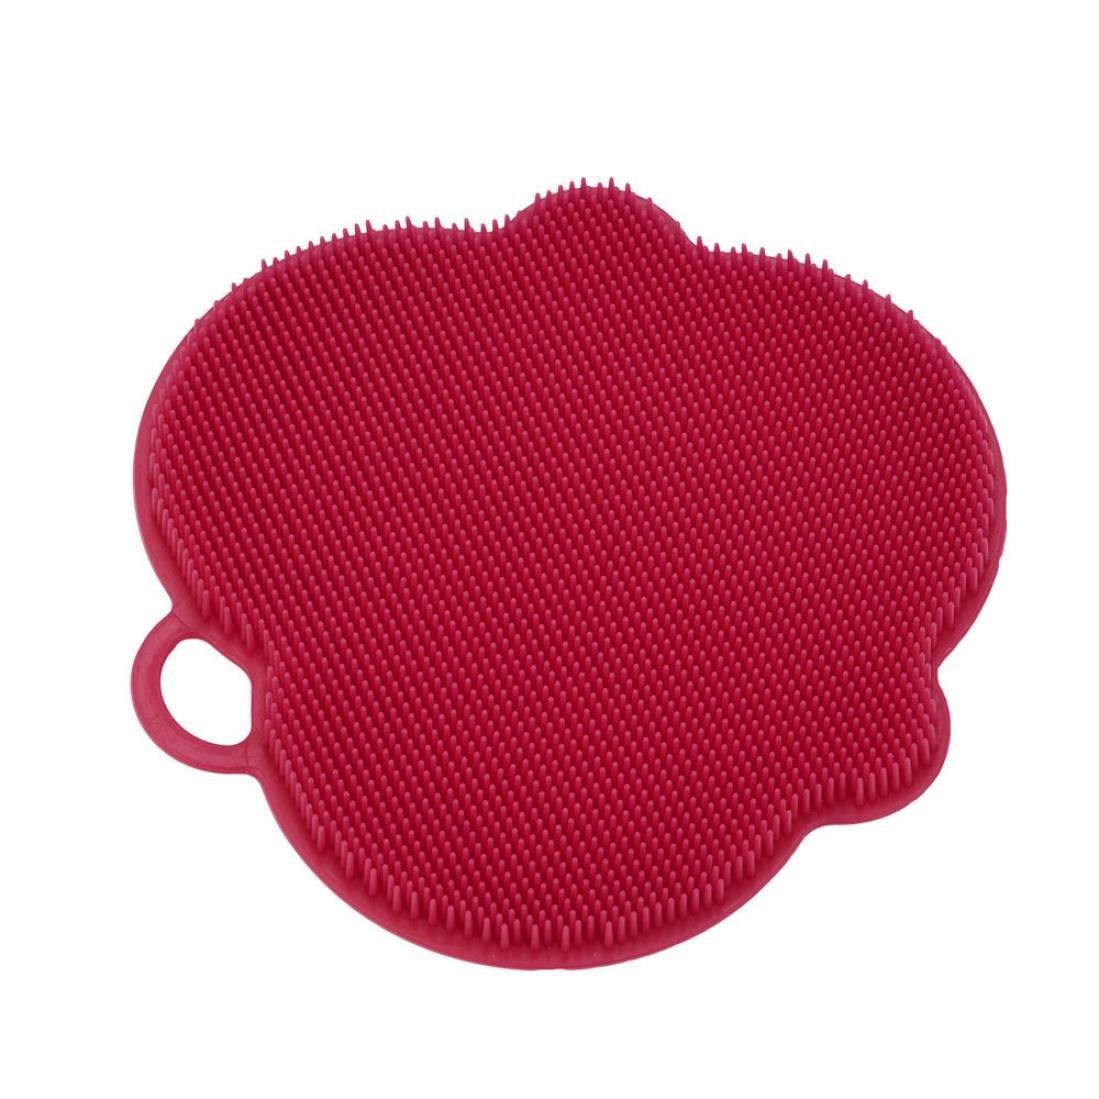 Digood Kitchen 1Pcs Antibacterial Silicone Non Stick Dishwashing Brush Sponge Scrubber Towel For Kitchen Wash Pot Pan Dish Bowl Fruit and Vegetable Cleaning Tool (Red)